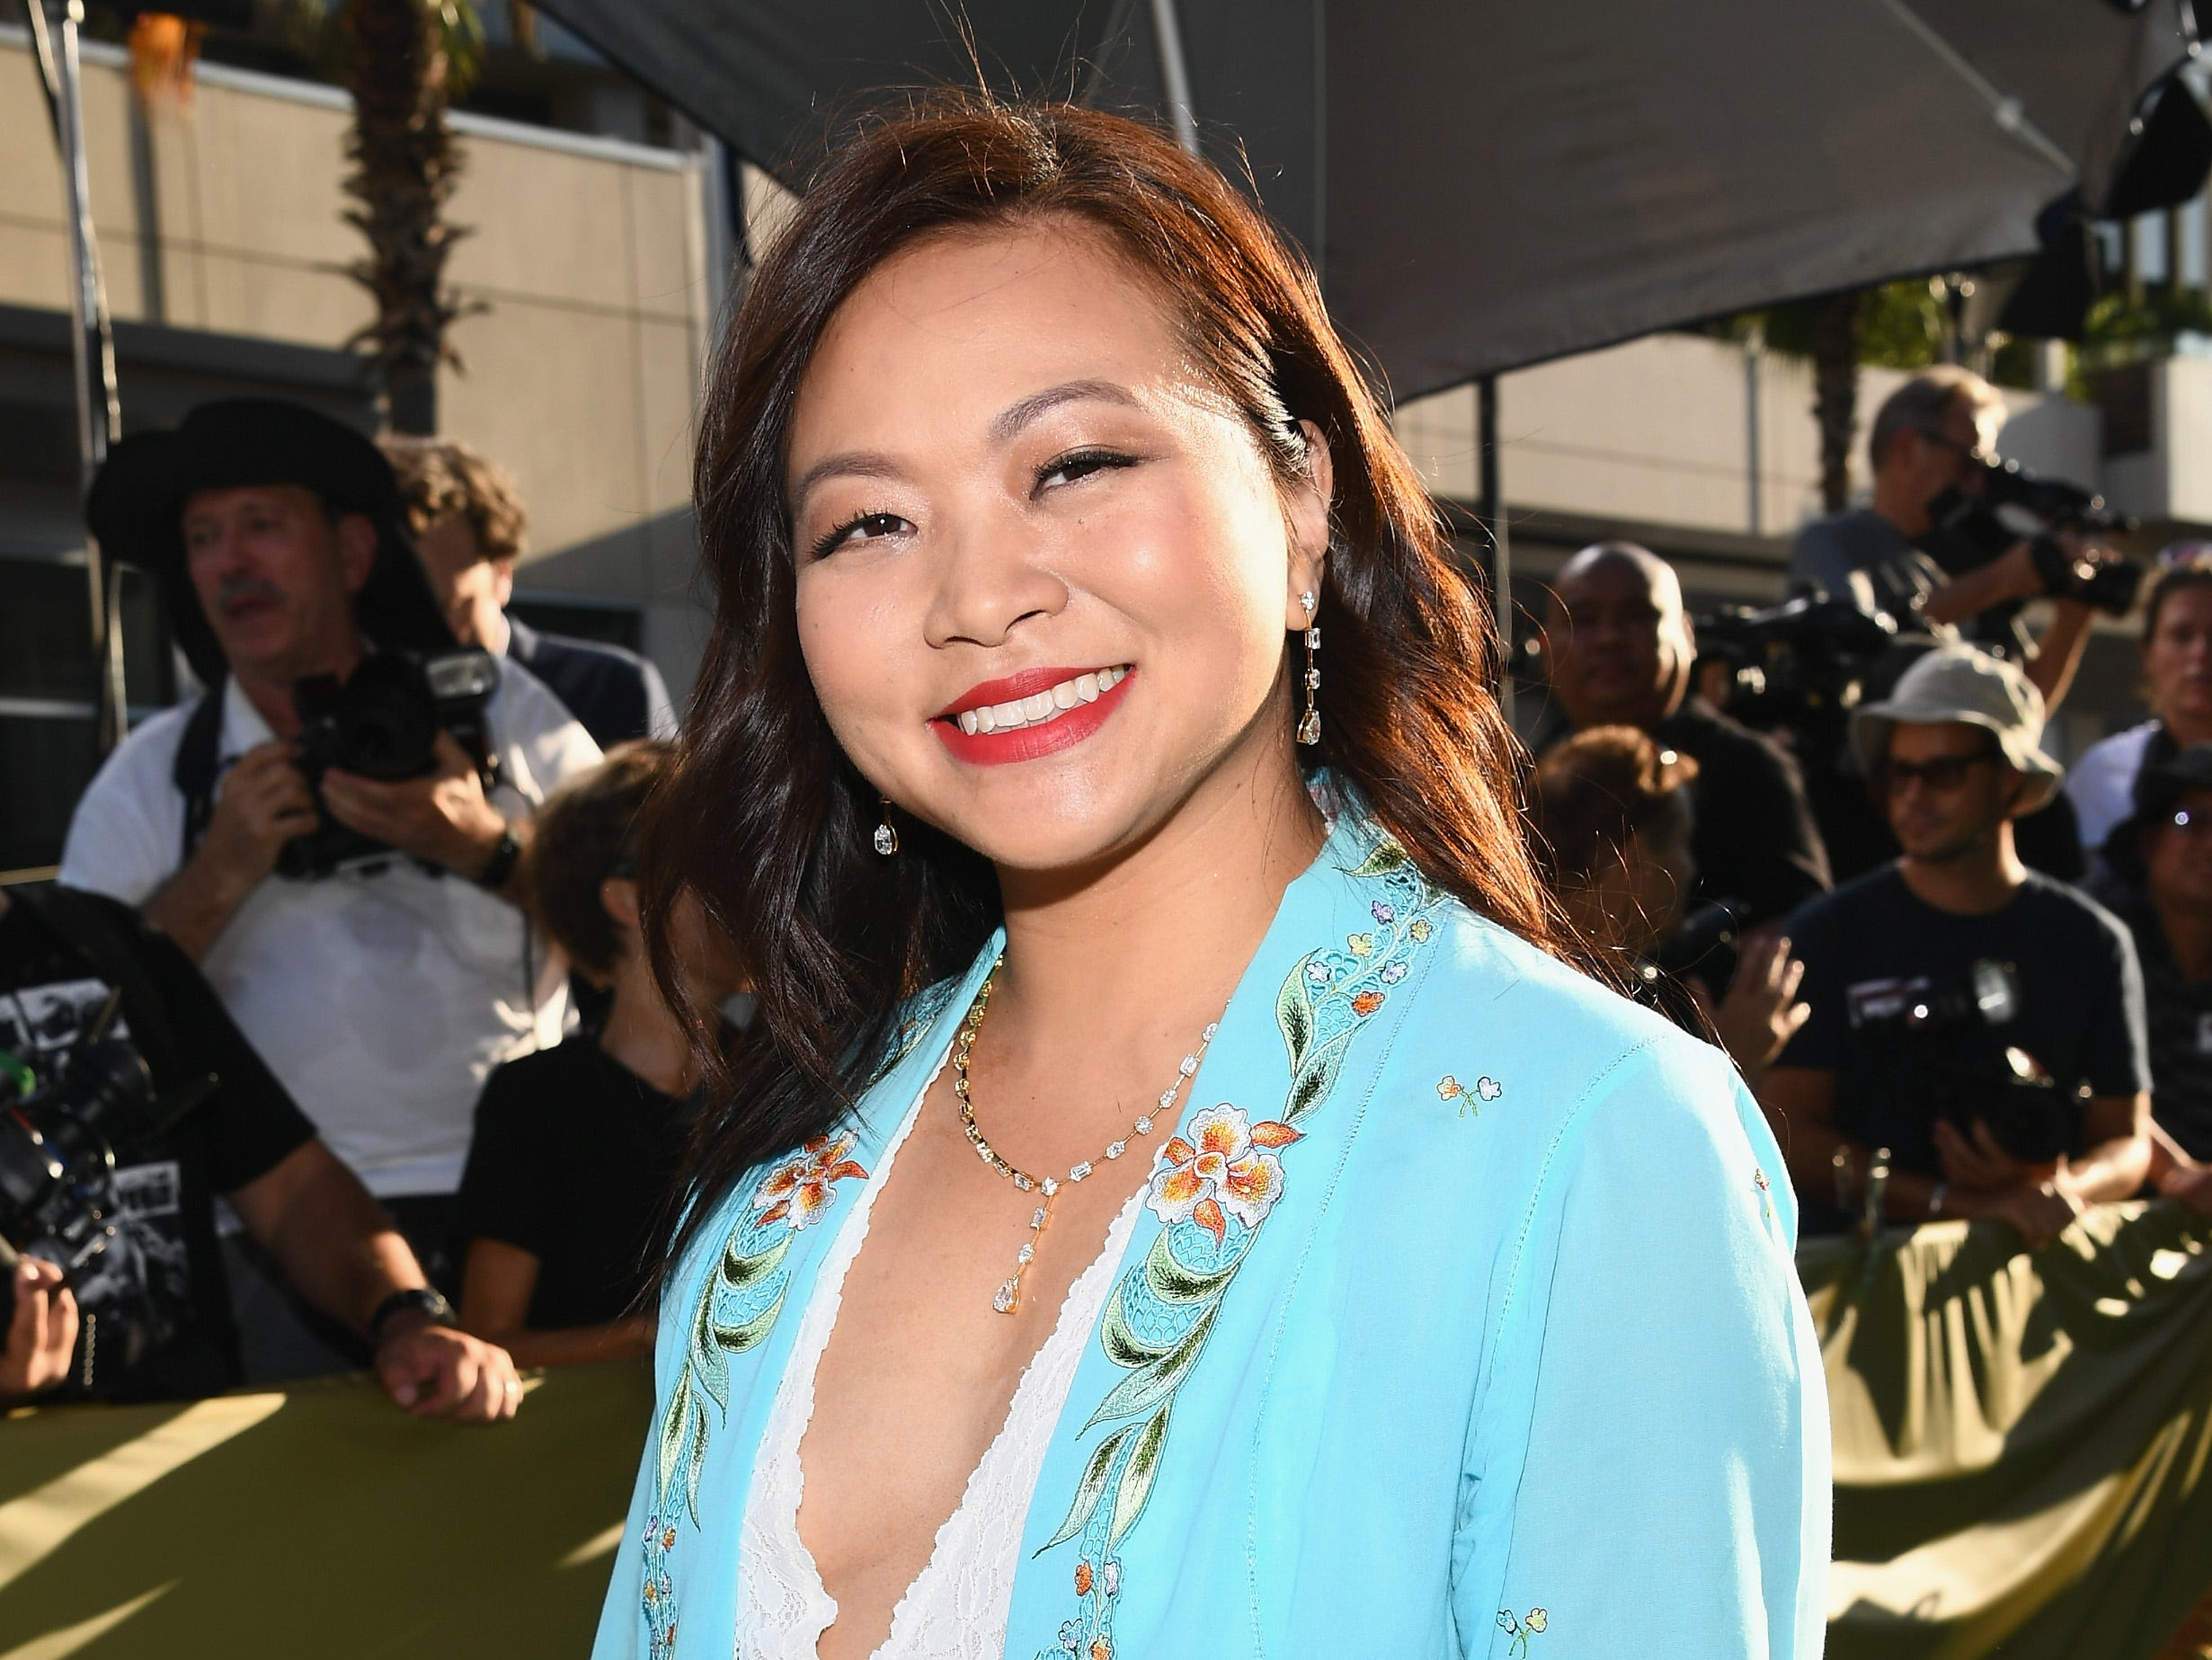 Screenwriter Adele Lim wore a bold blazer.